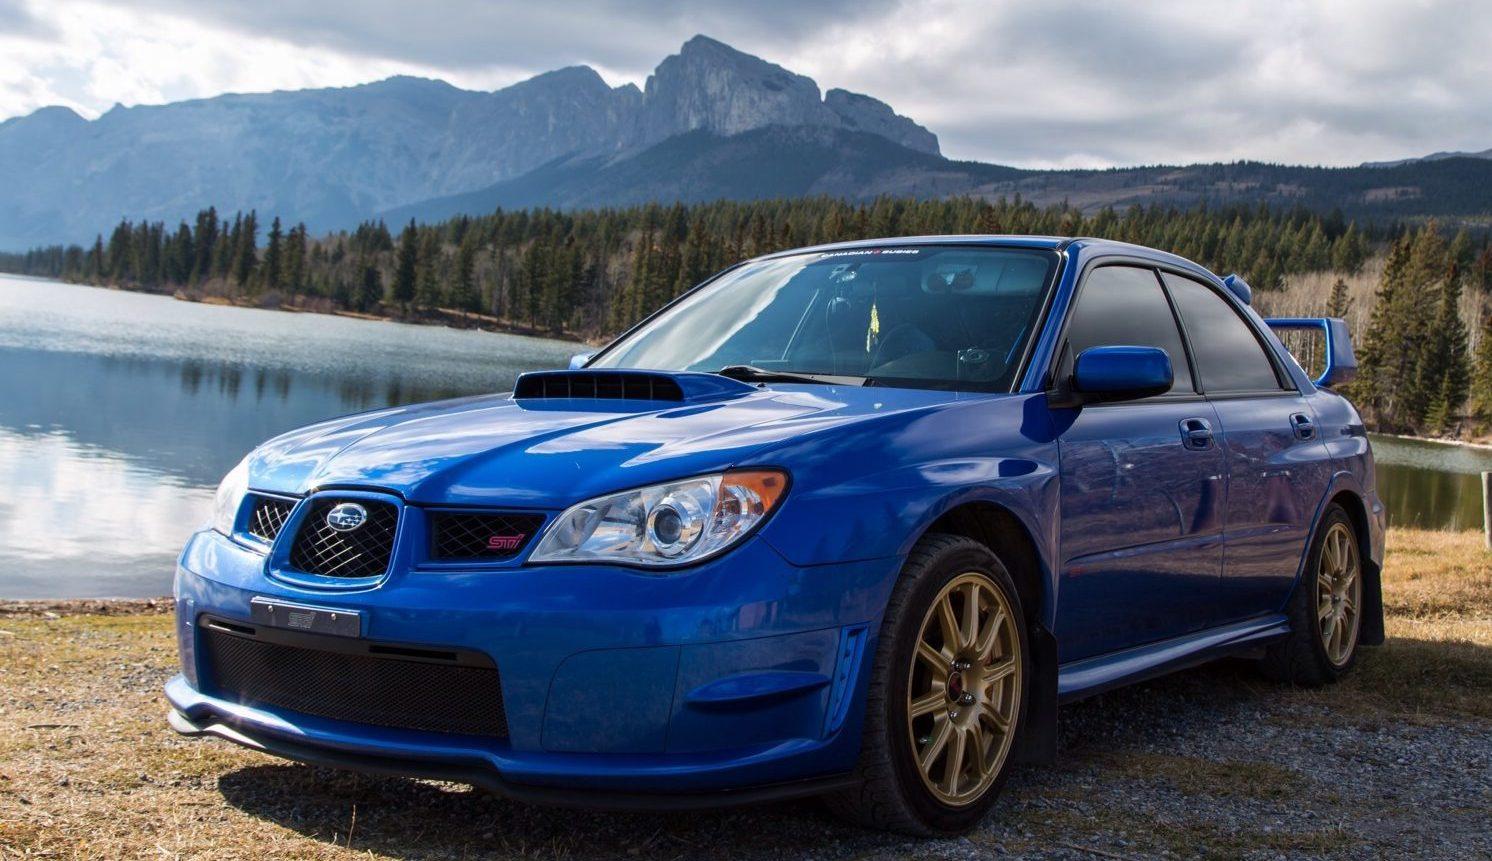 Buying A Subaru Wrx Sti Complete Guide Garage Dreams